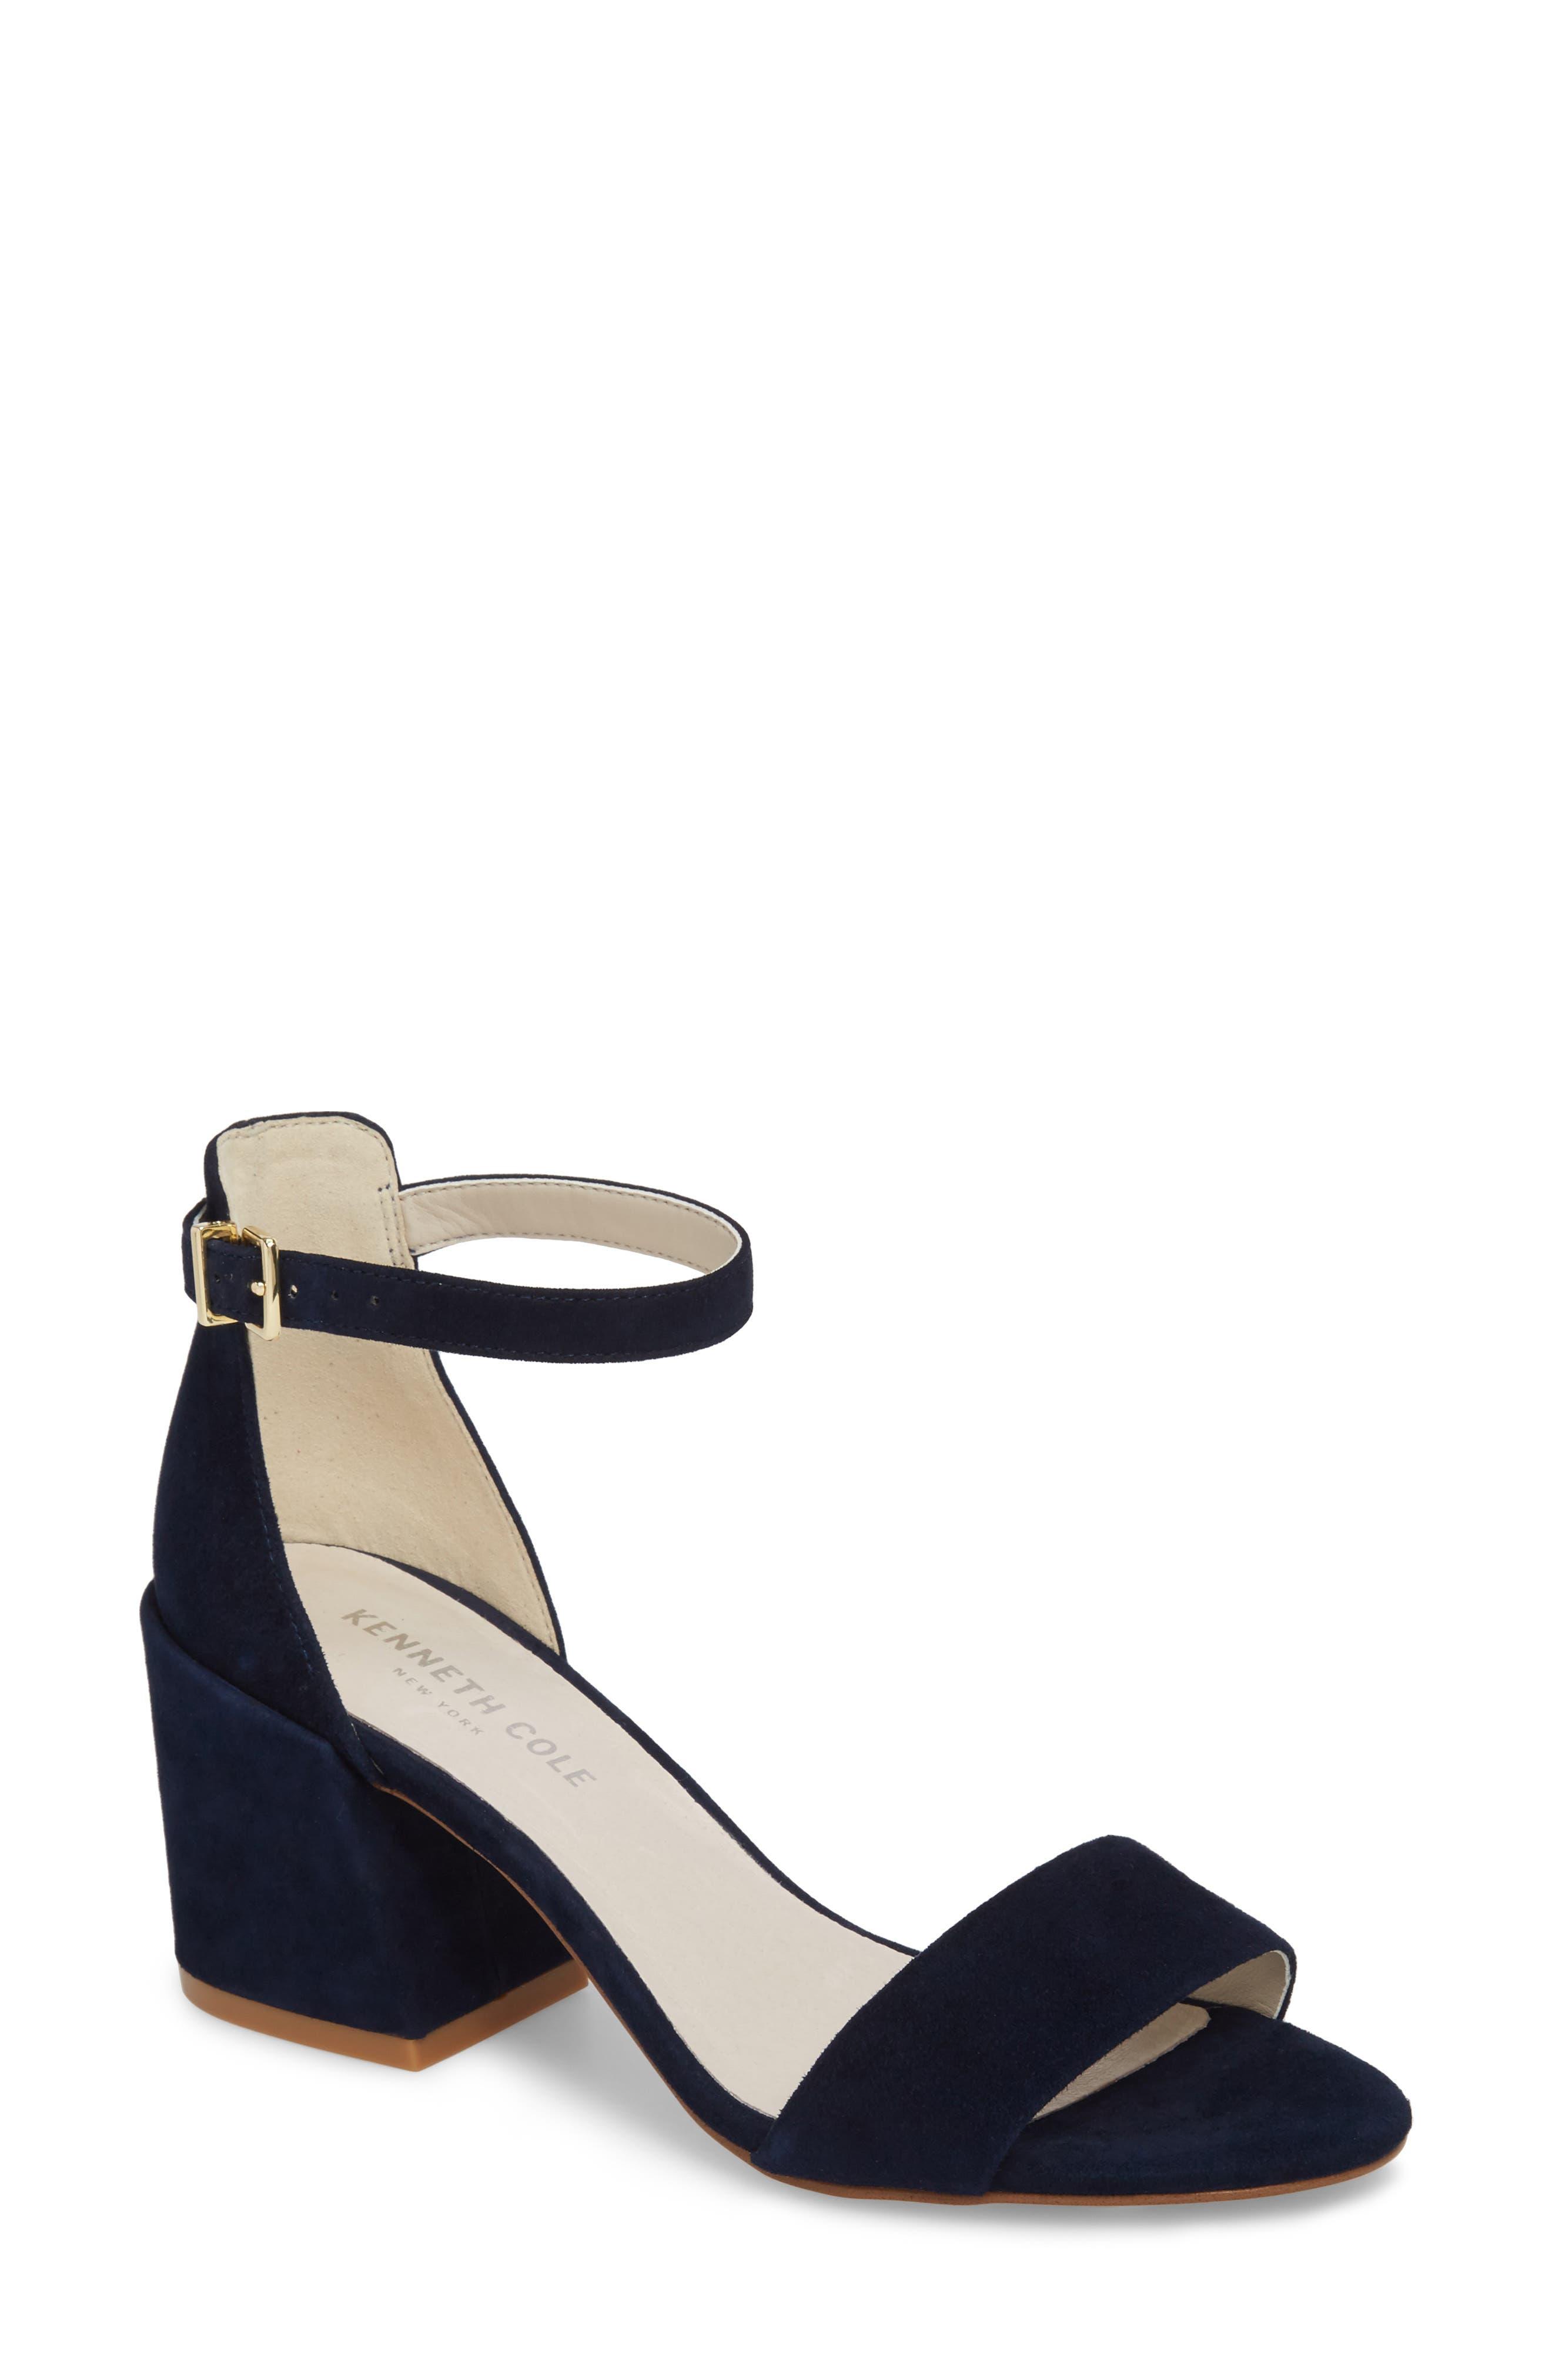 Hannon Block Heel Ankle Strap Sandal,                             Main thumbnail 1, color,                             Navy Suede